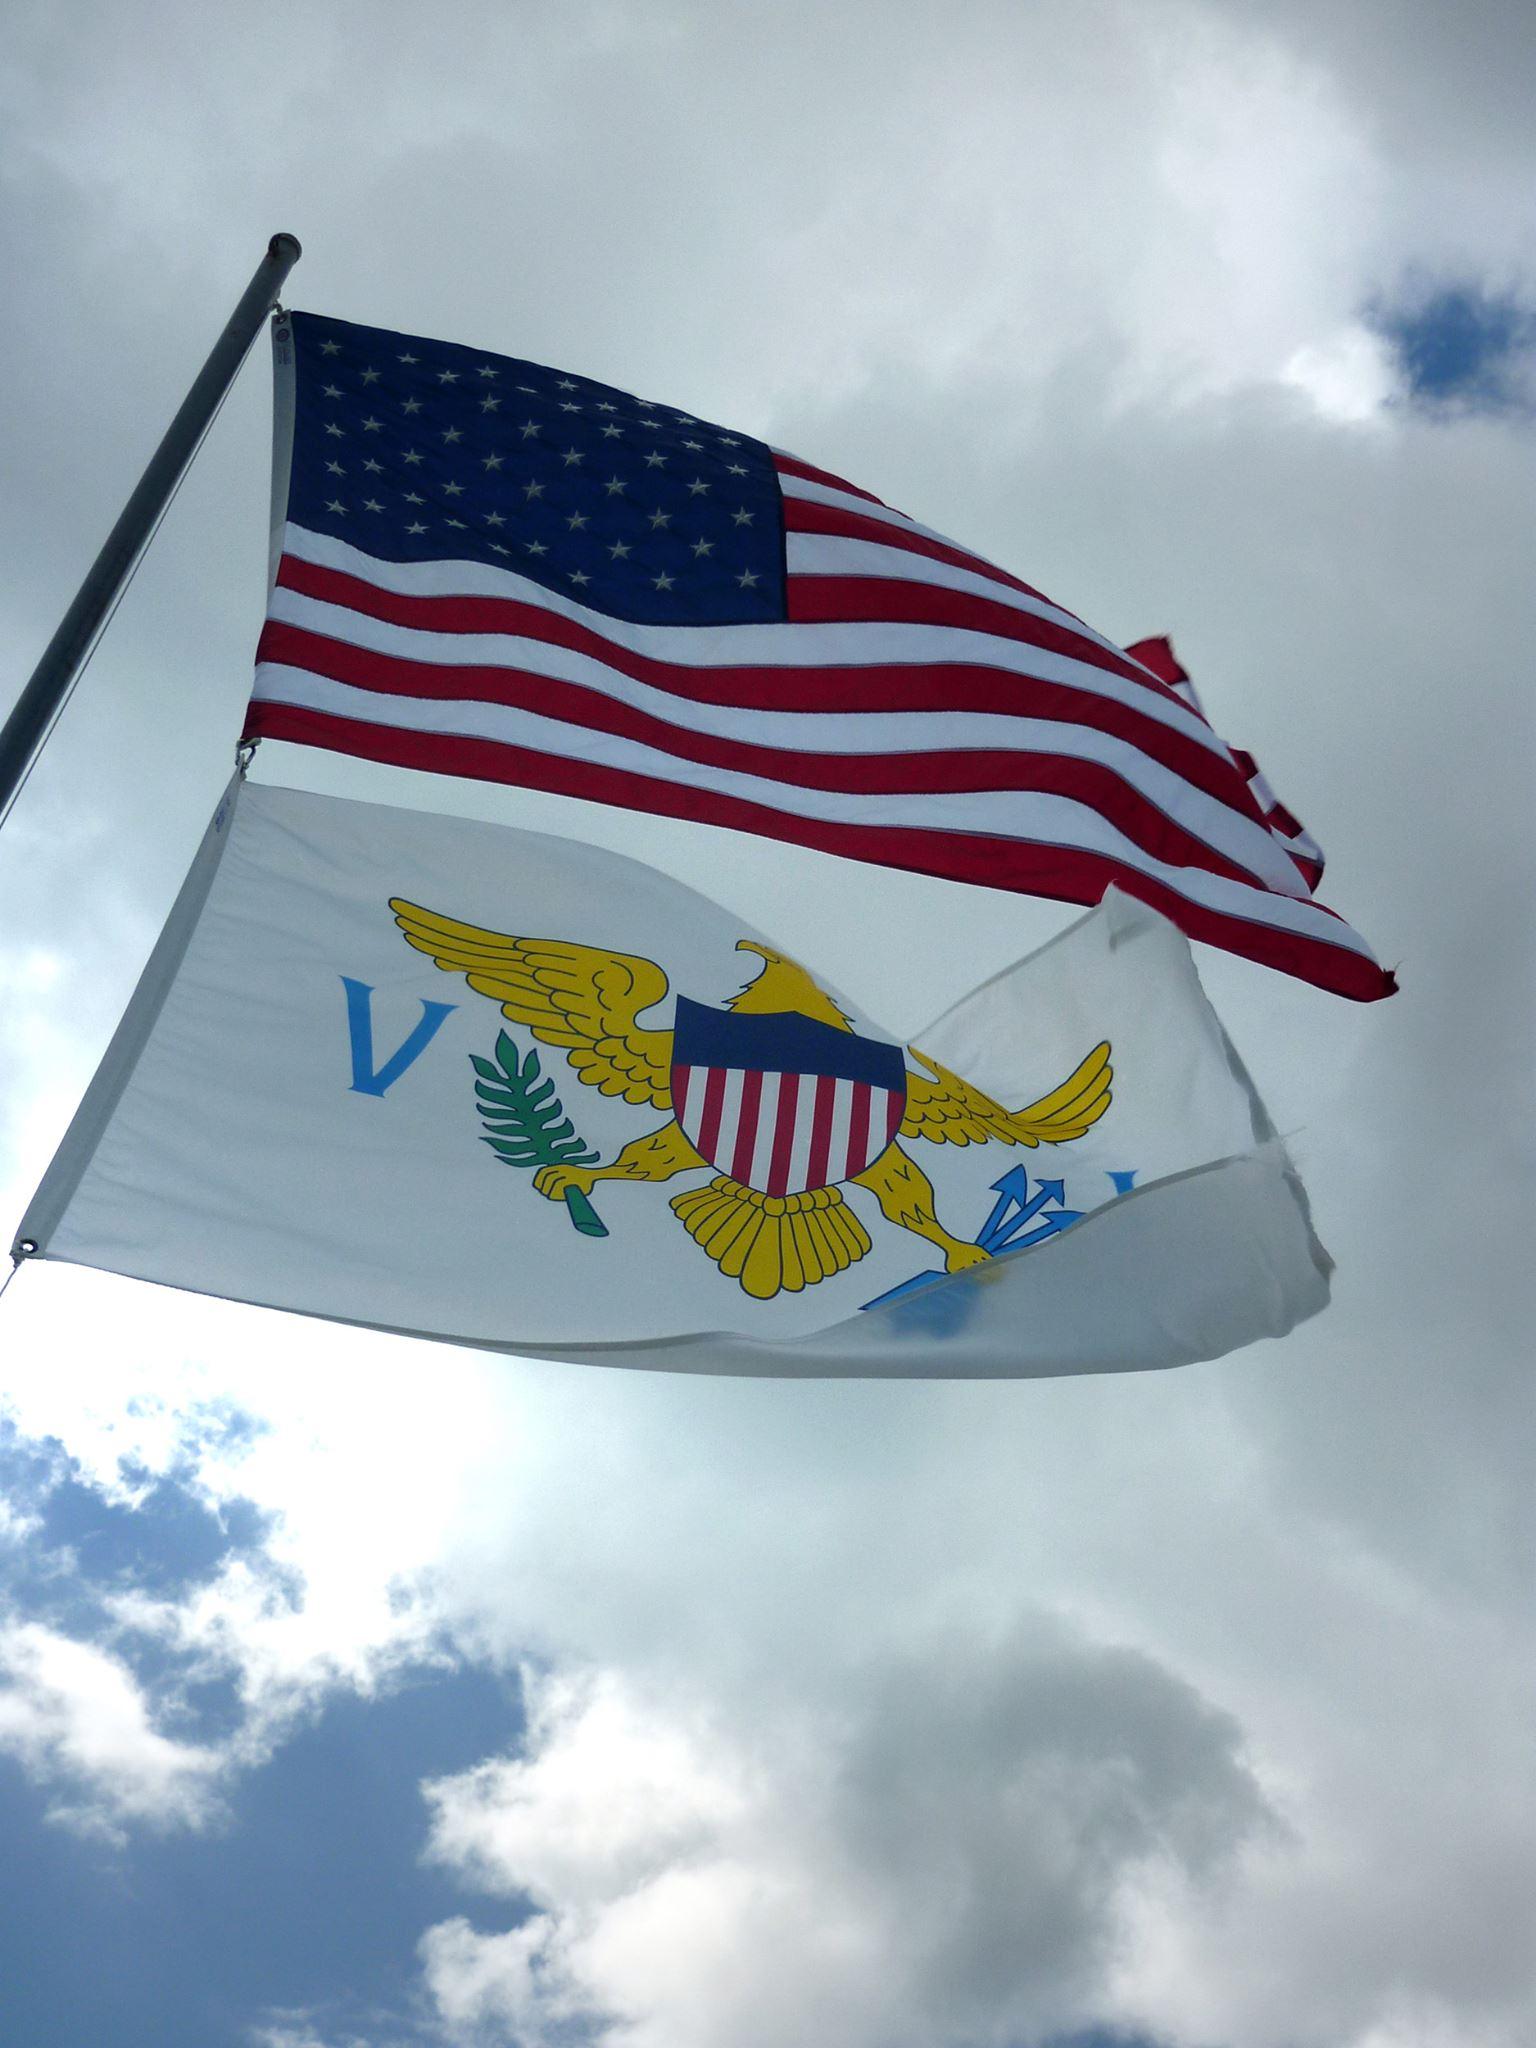 America Virgin Islands Real Estate